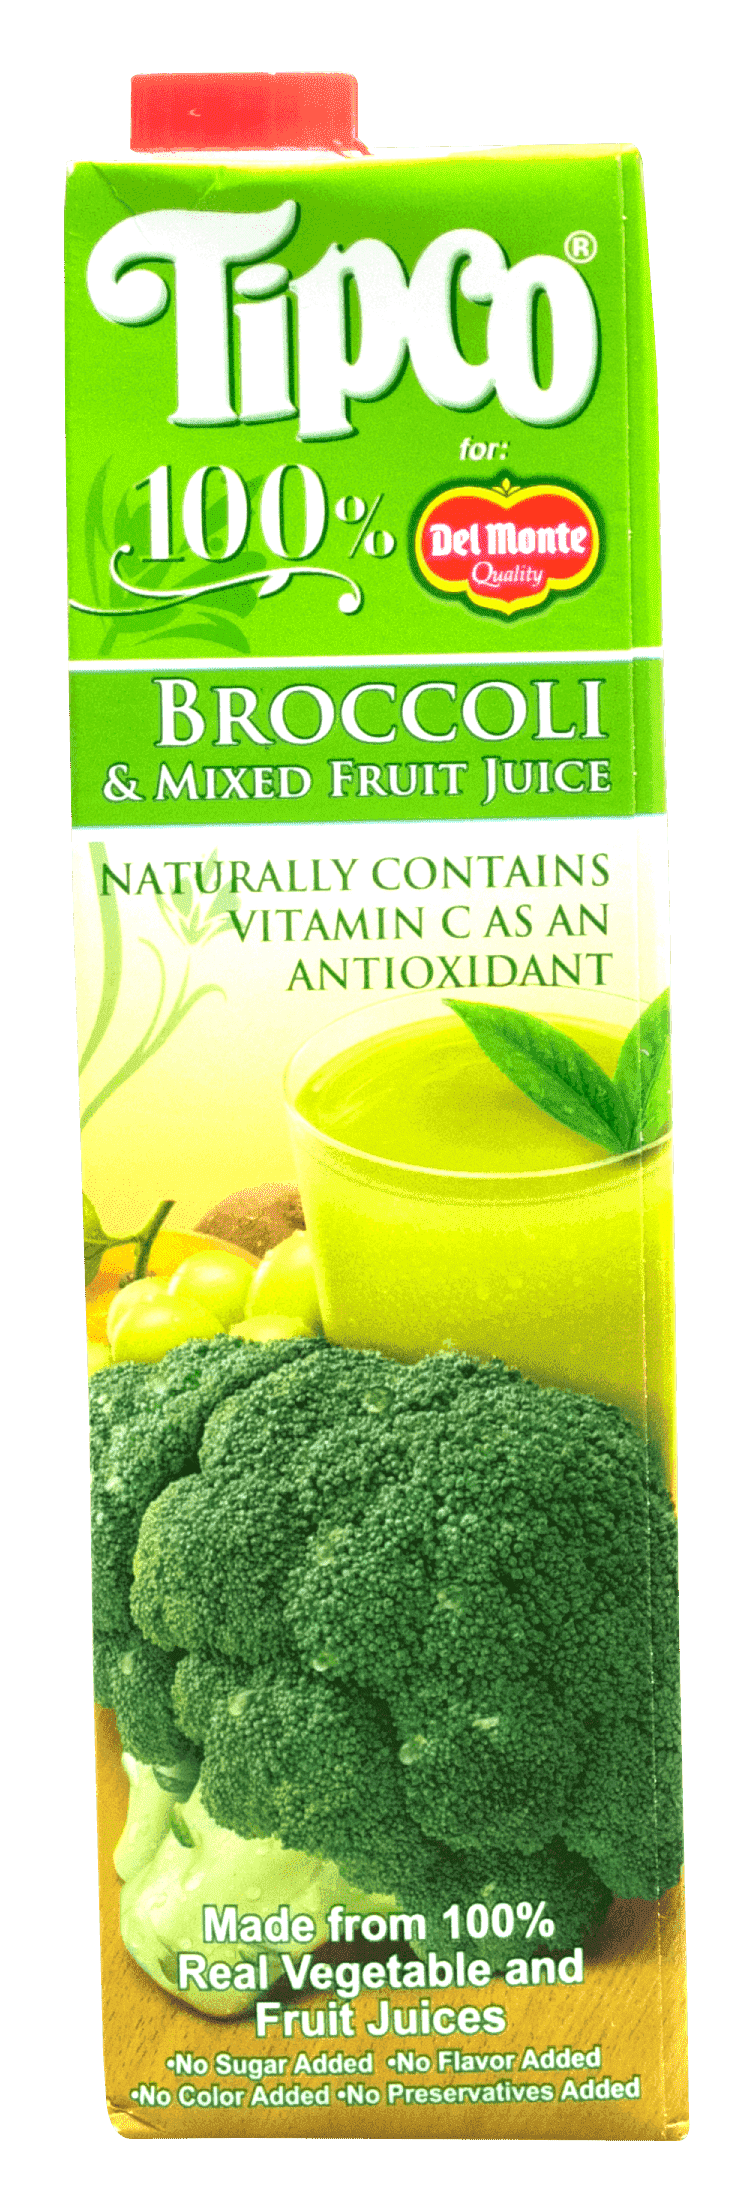 Tipco 100% Broccoli & Mixed Fruit Juice